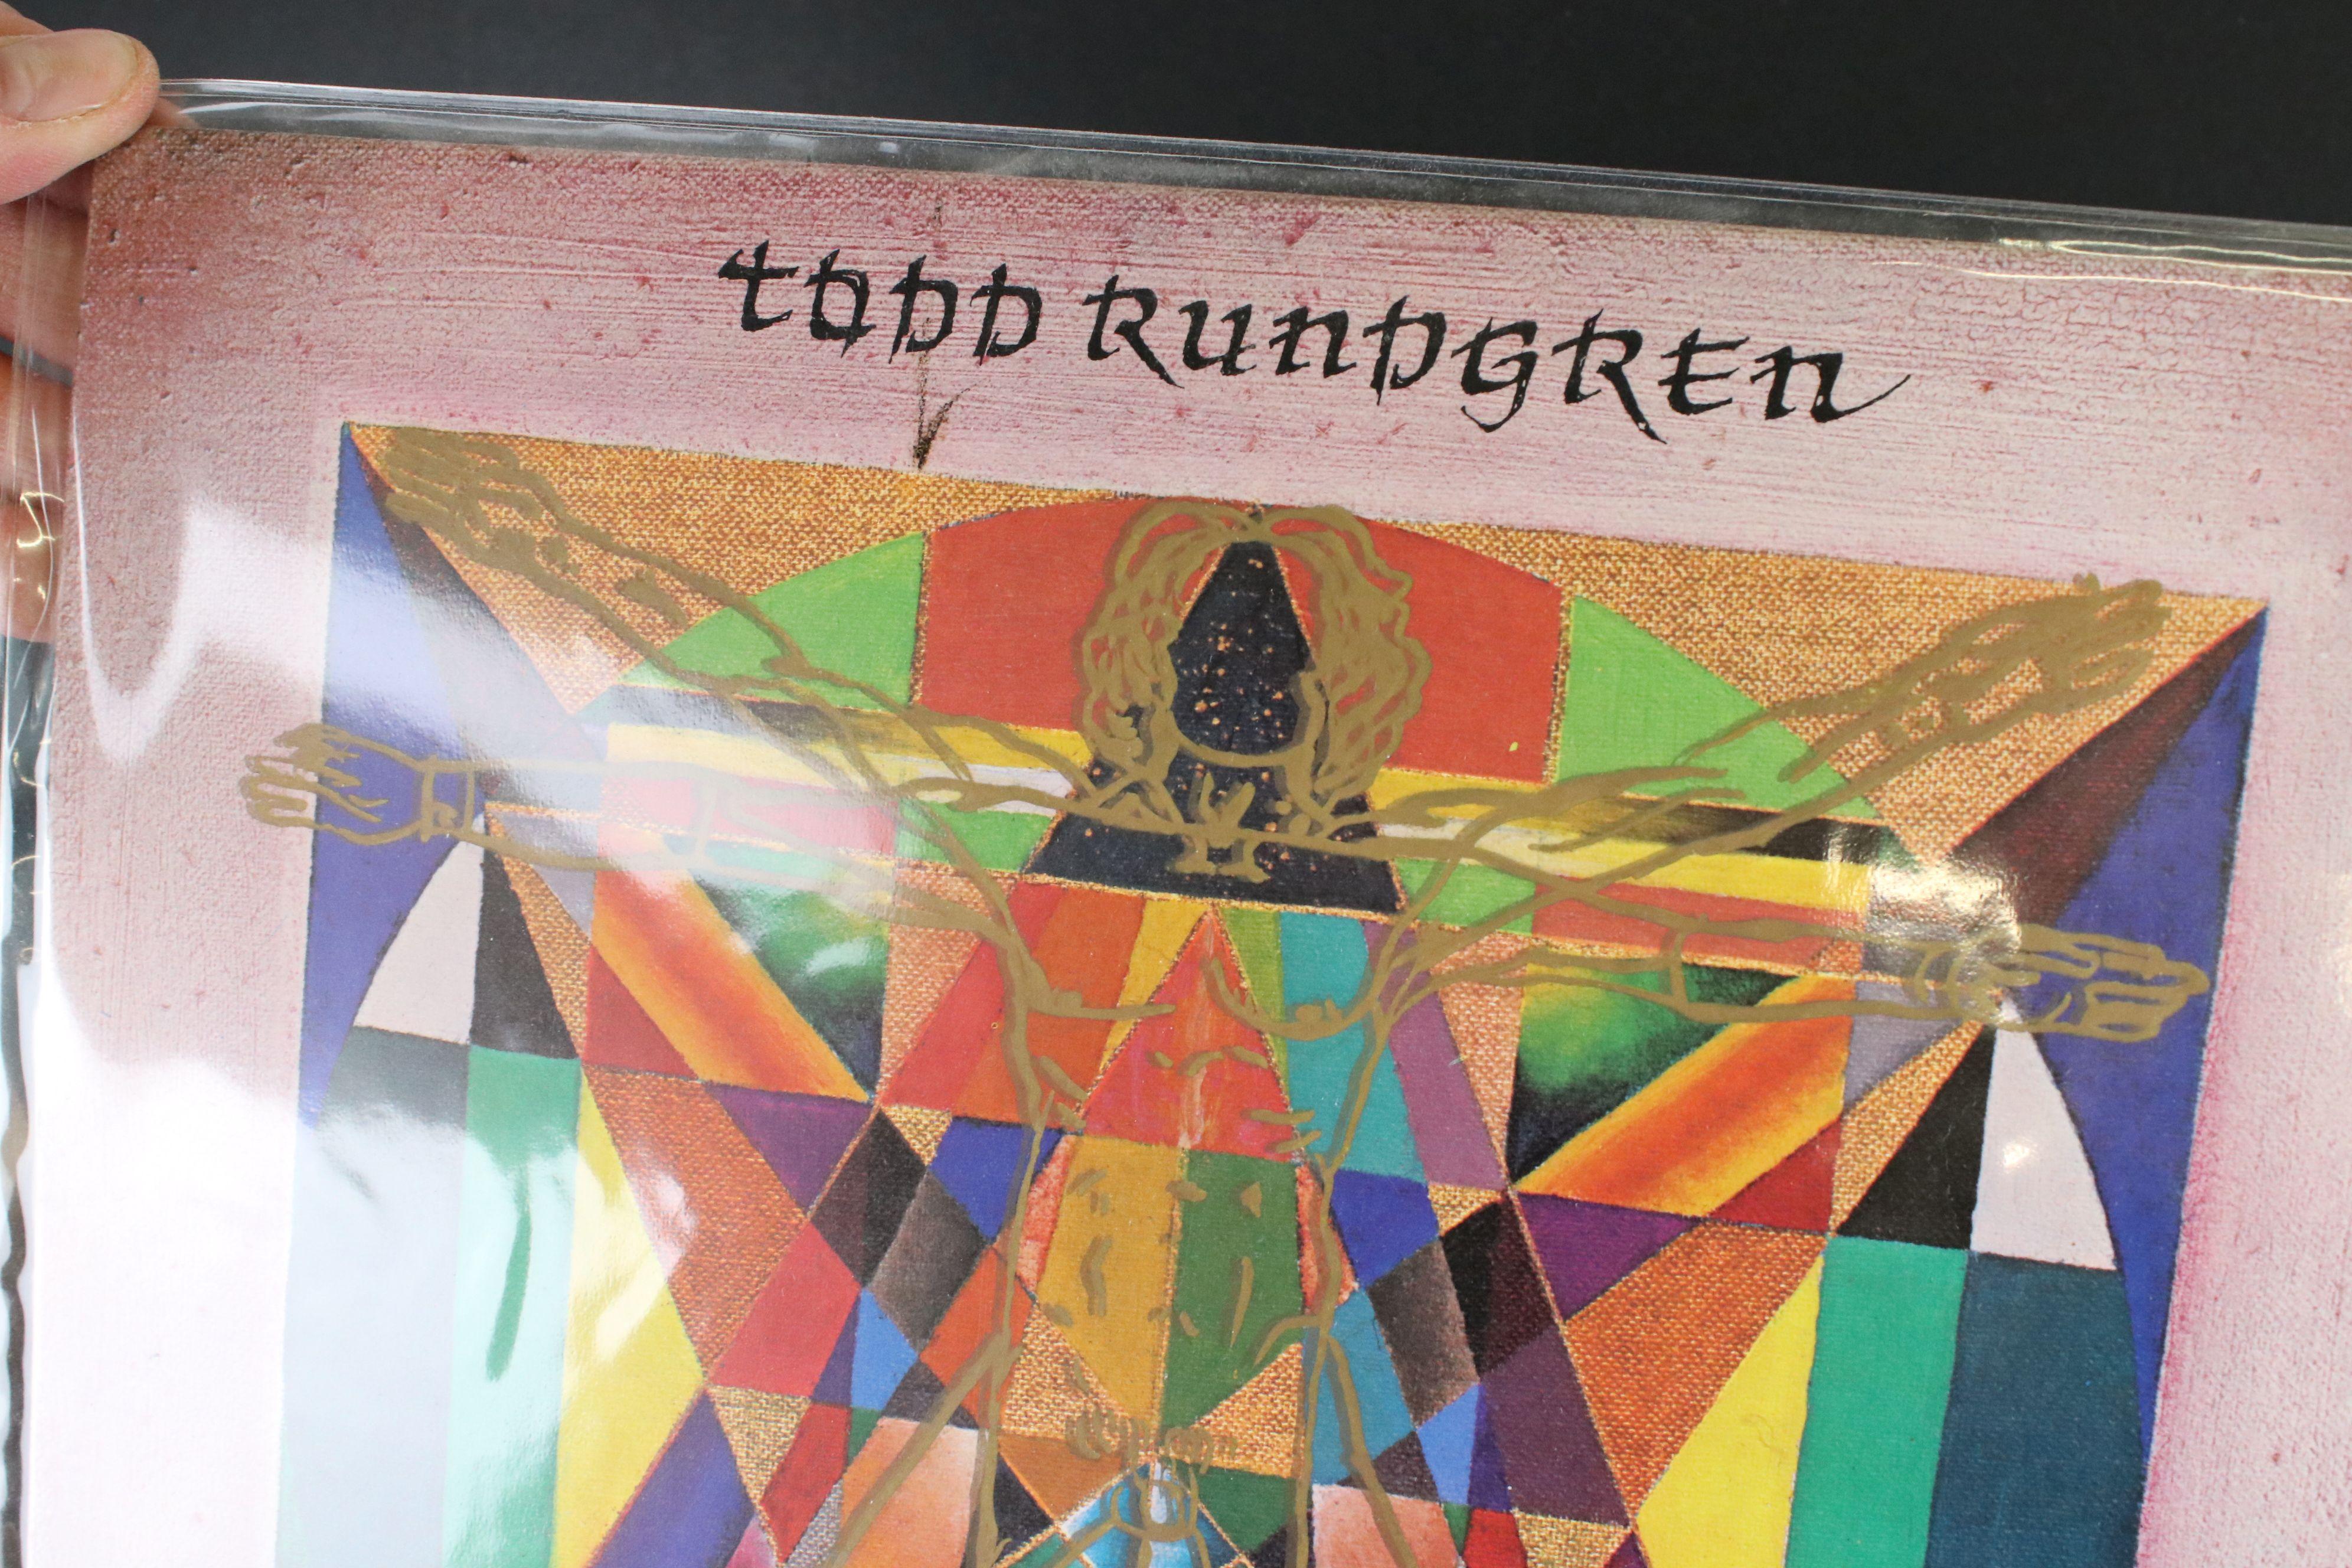 Vinyl - Around 65 US Rock LPs to include Rush, Todd Rundgren, Kiss, Steeley Dan, Lone Star etc, - Image 2 of 9